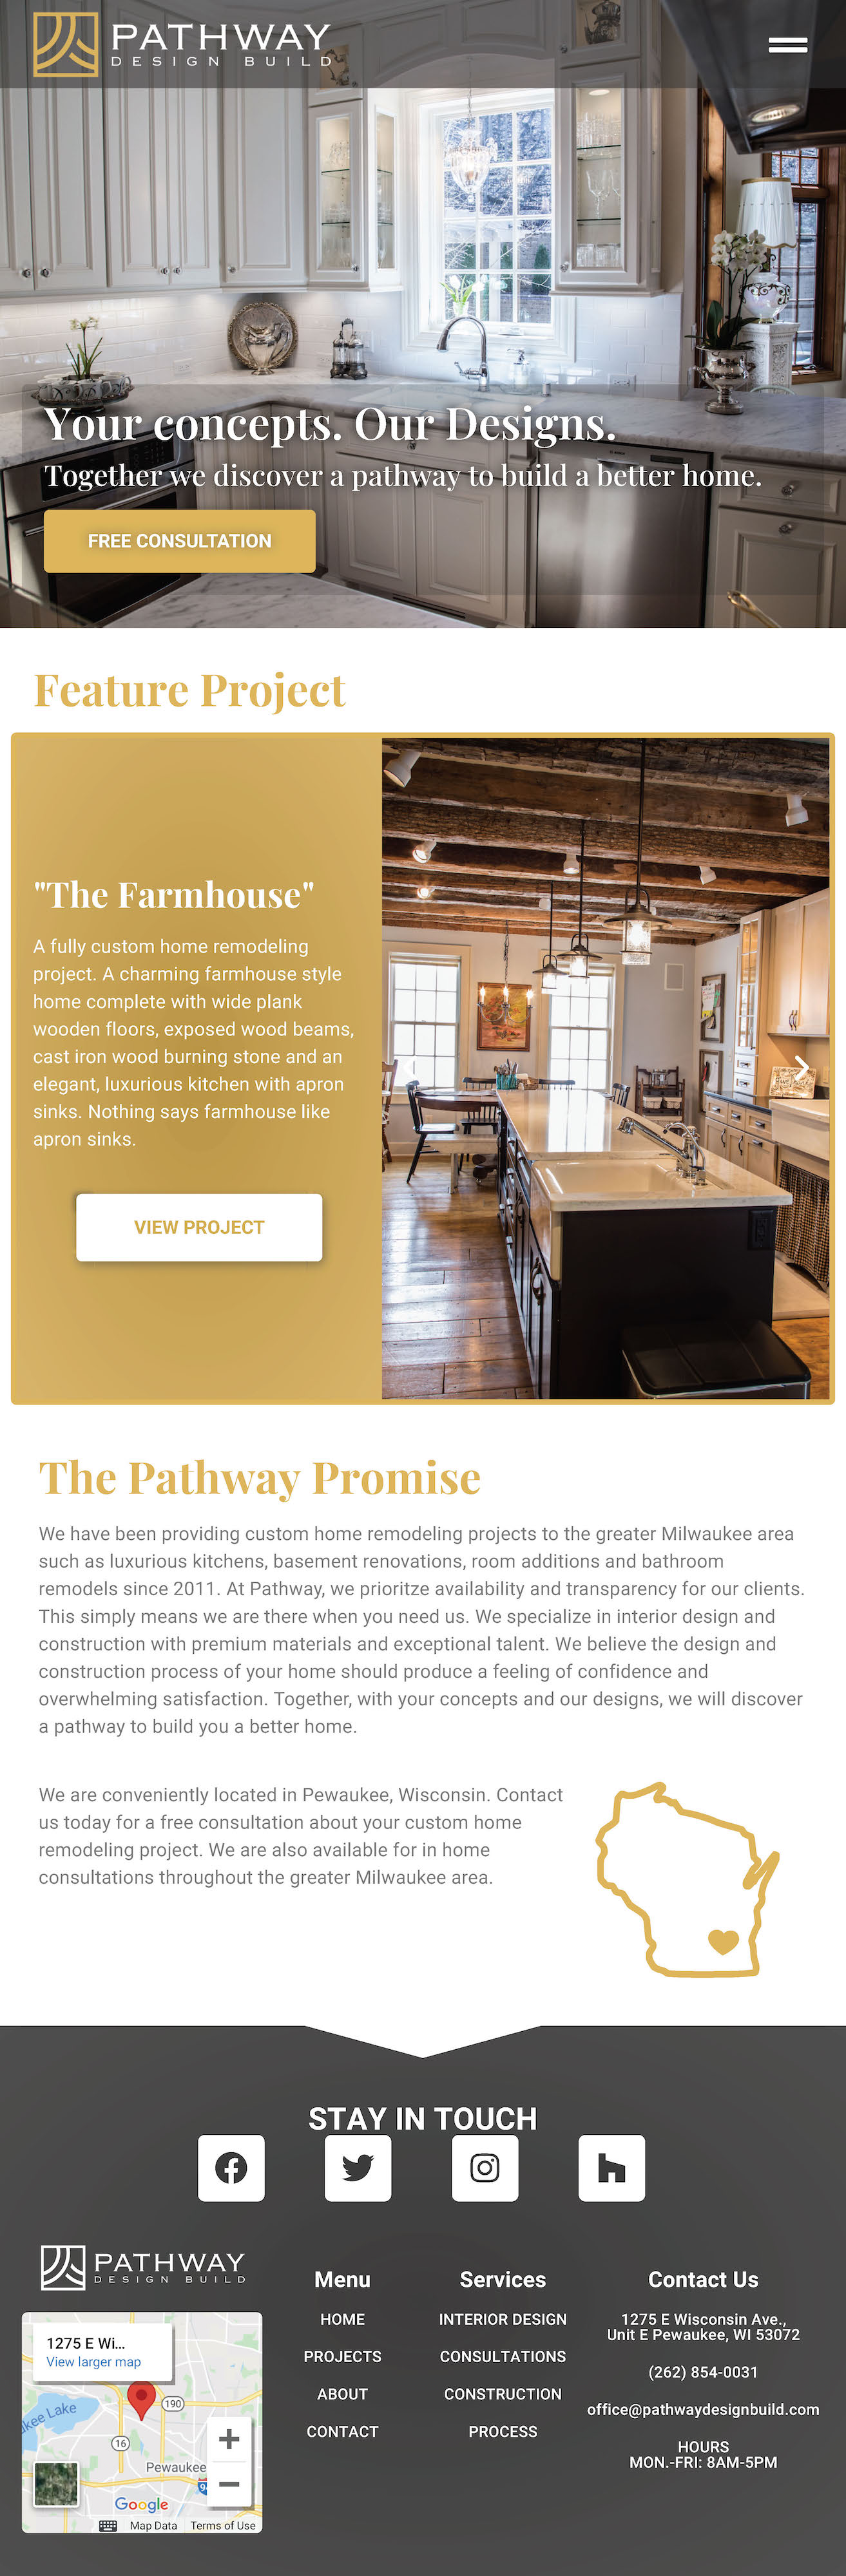 Pathway Design Build Homepage- Tablet